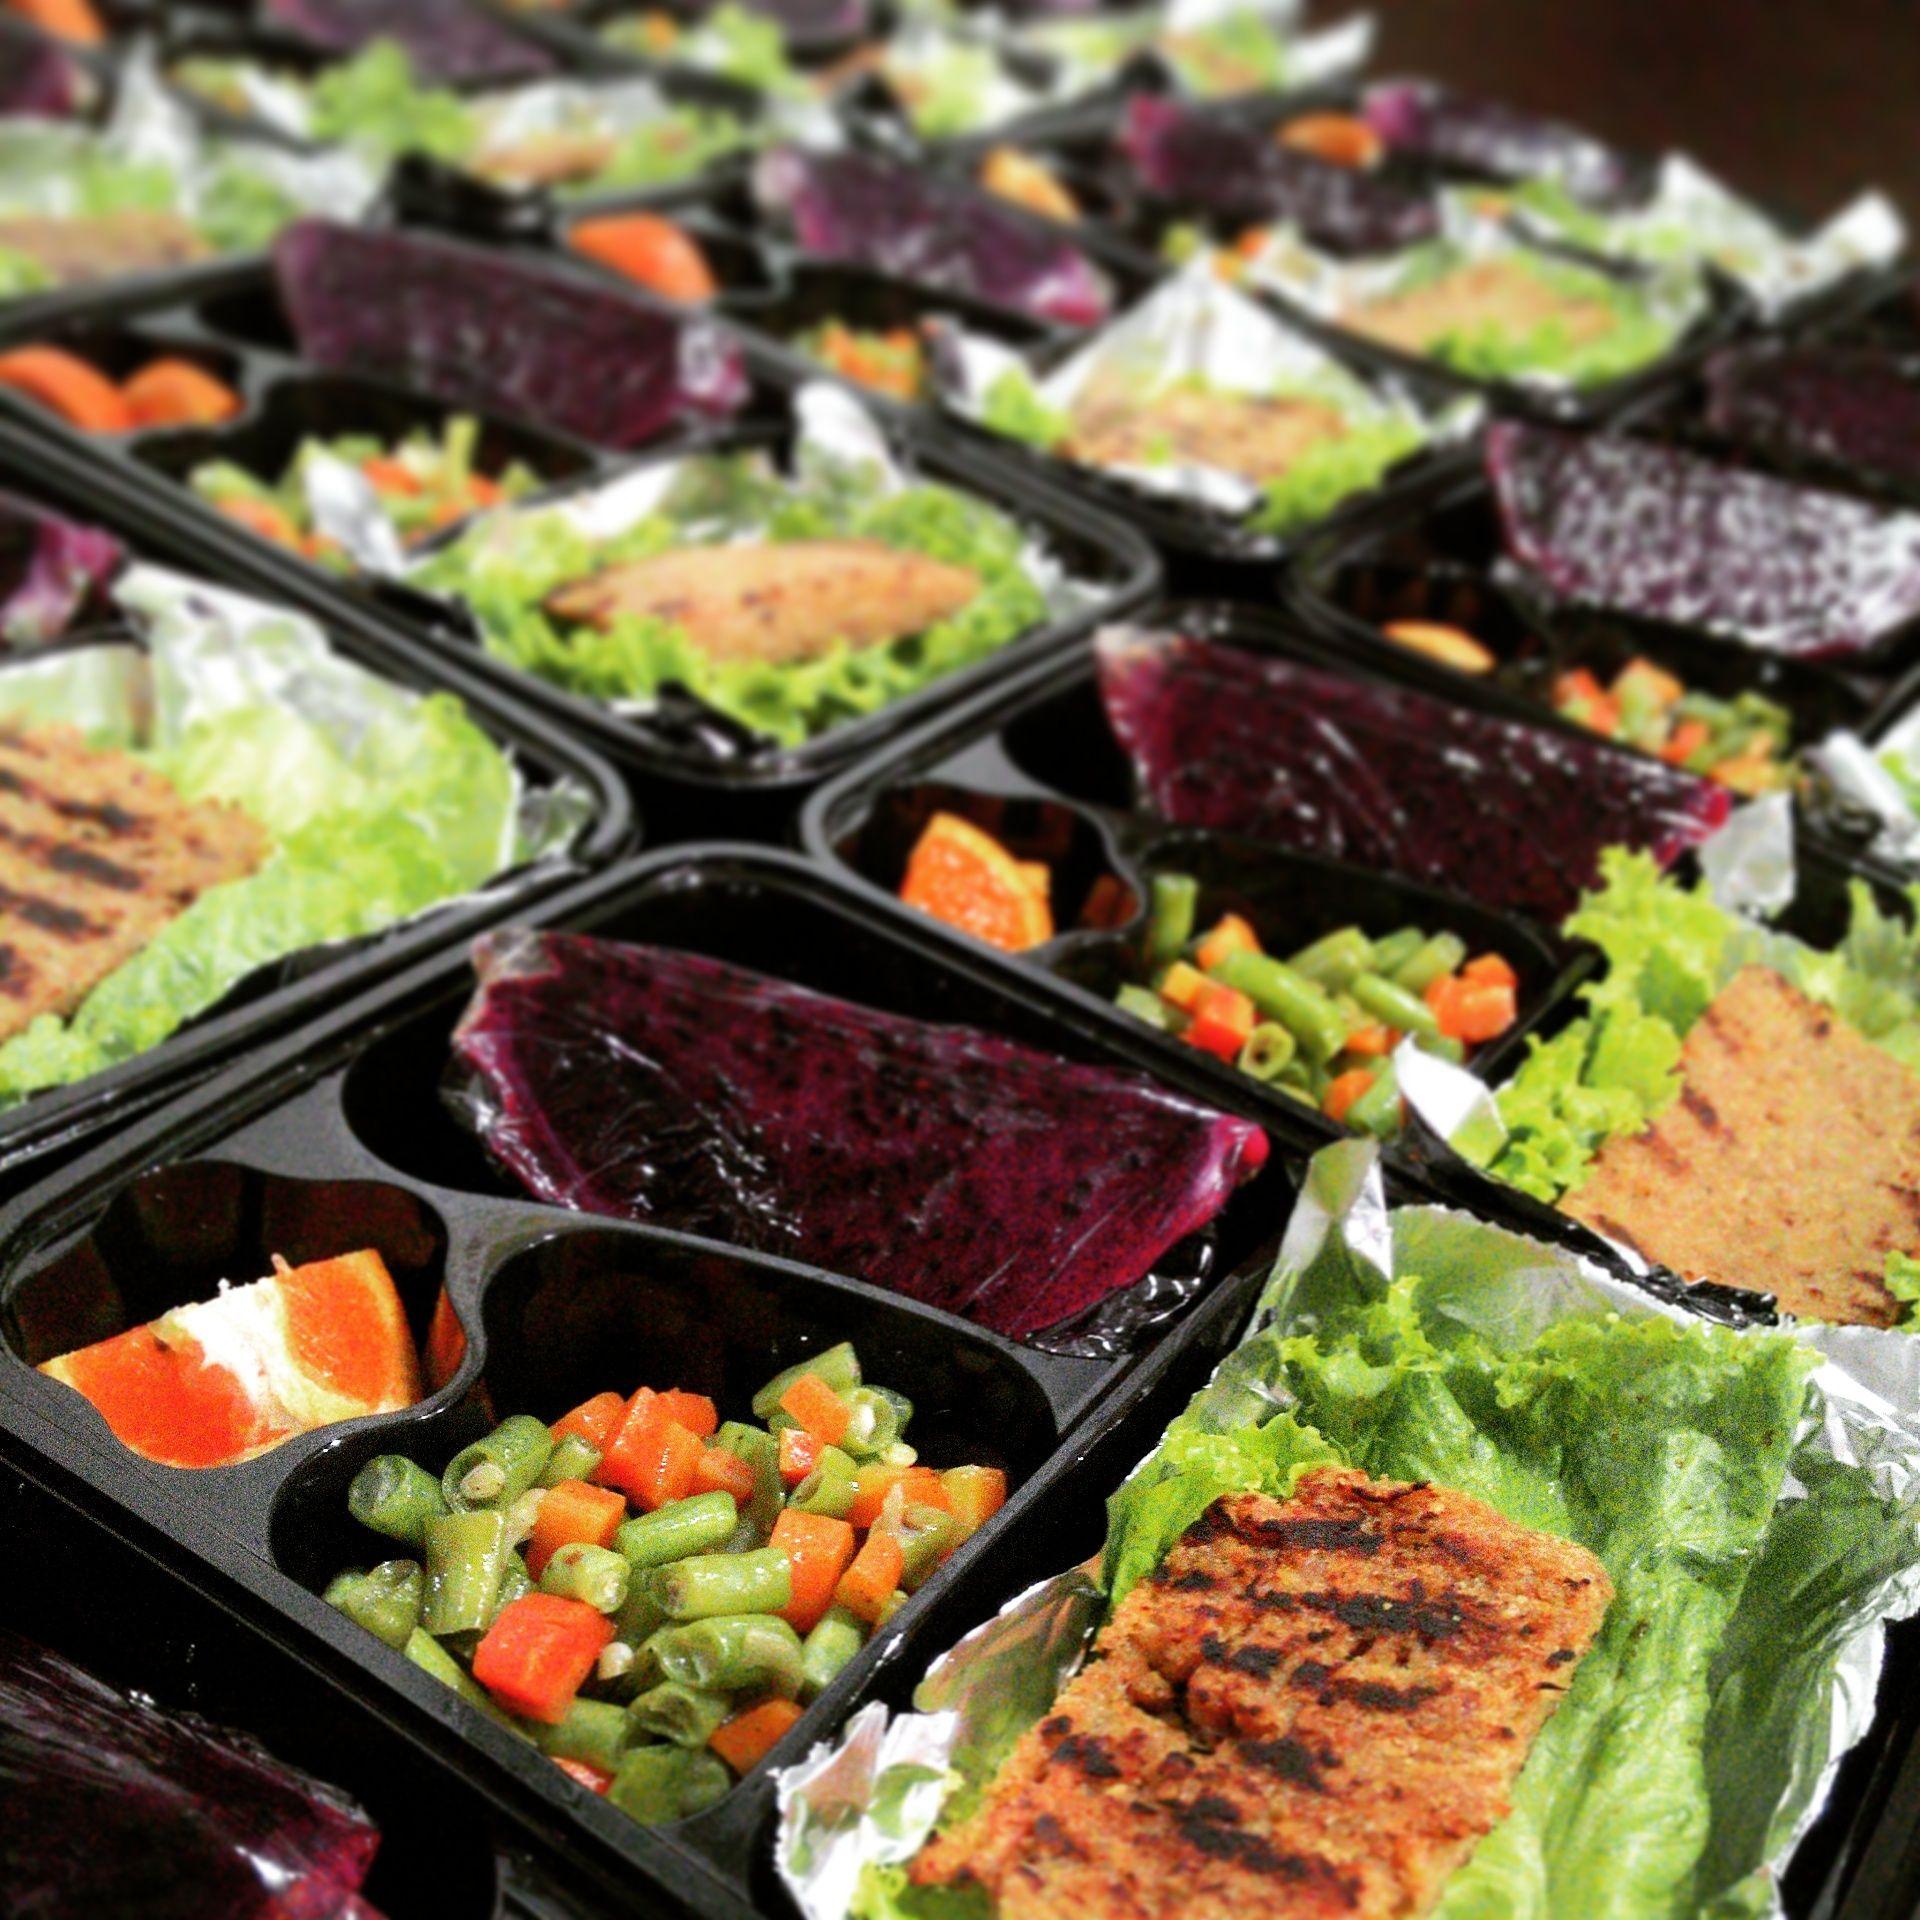 Catering Diet Mayo Sehat Surabaya & Sidoarjo Dapatkan